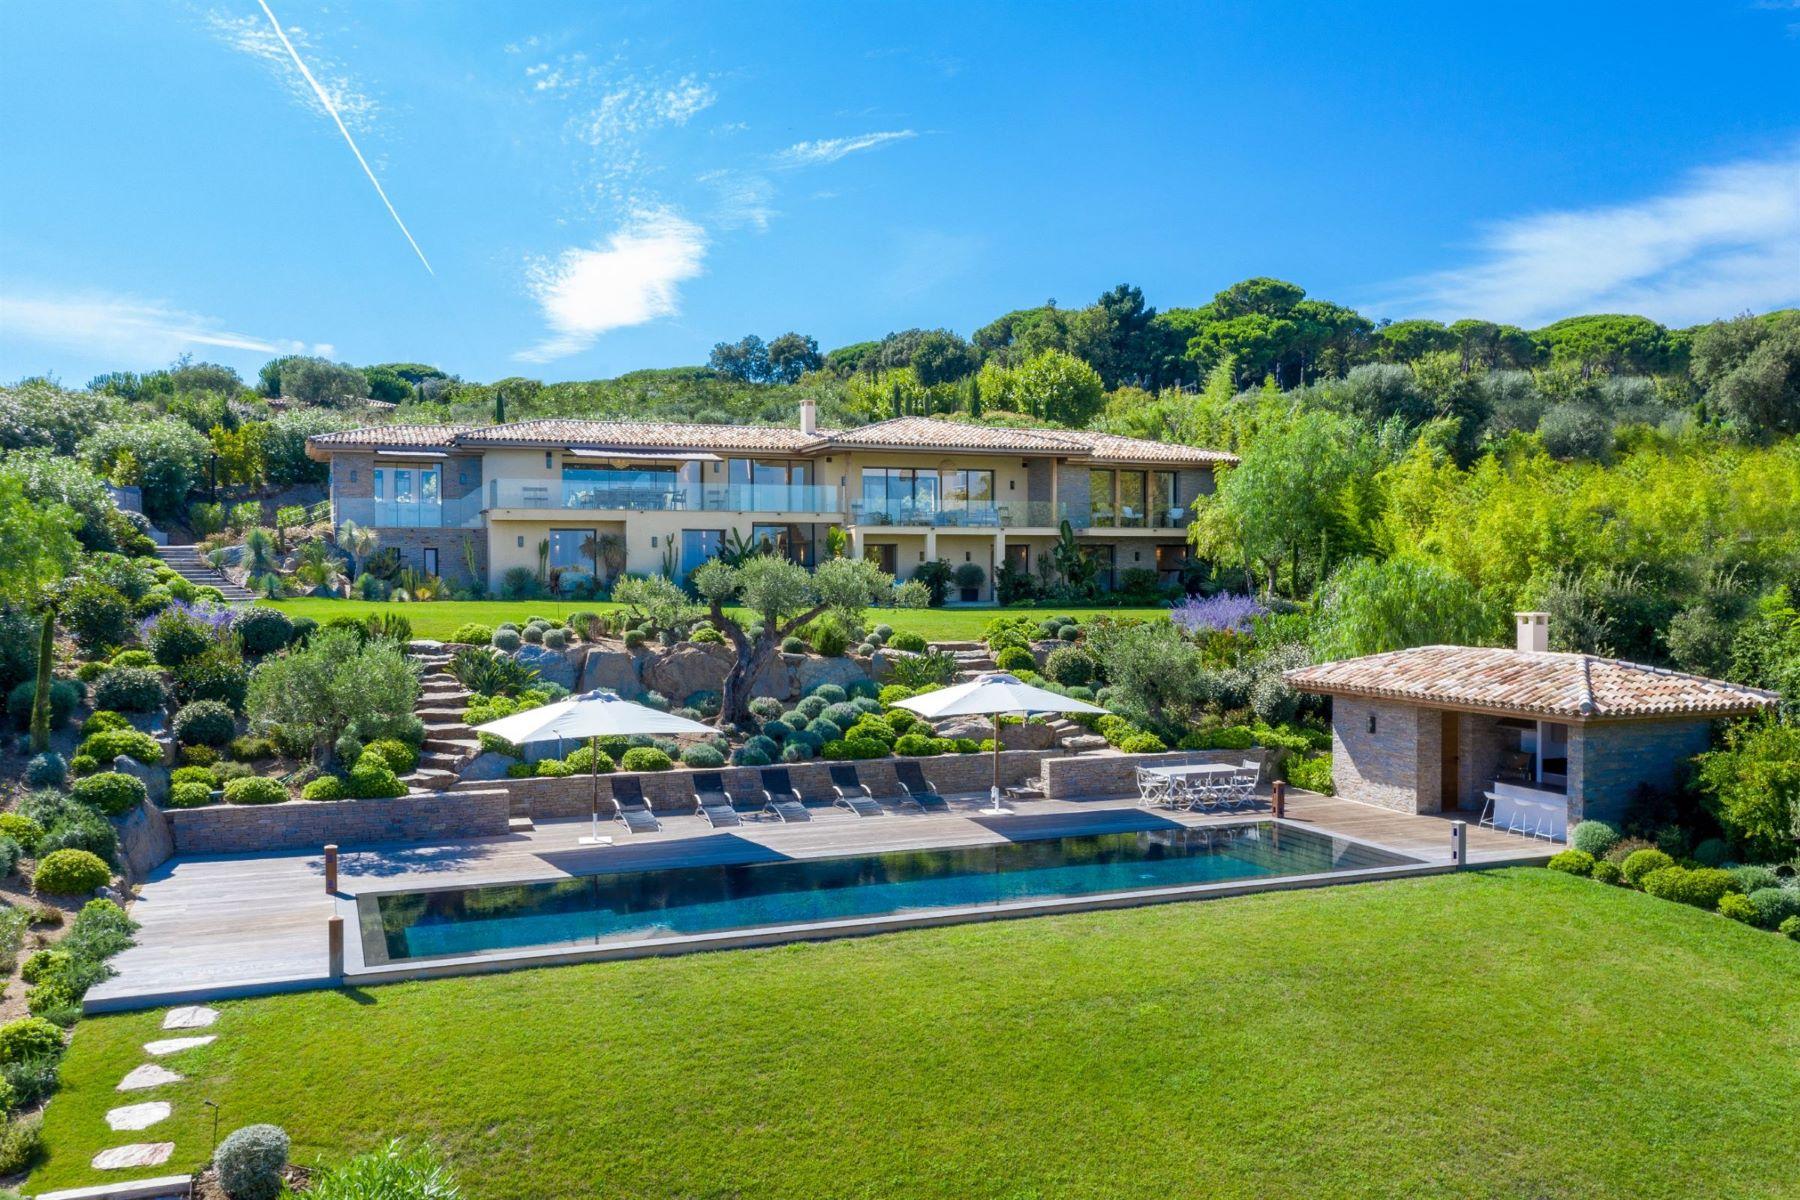 Single Family Homes for Sale at Magnificent contemporary style property in Saint-Tropez Saint Tropez, Provence-Alpes-Cote D'Azur 83990 France